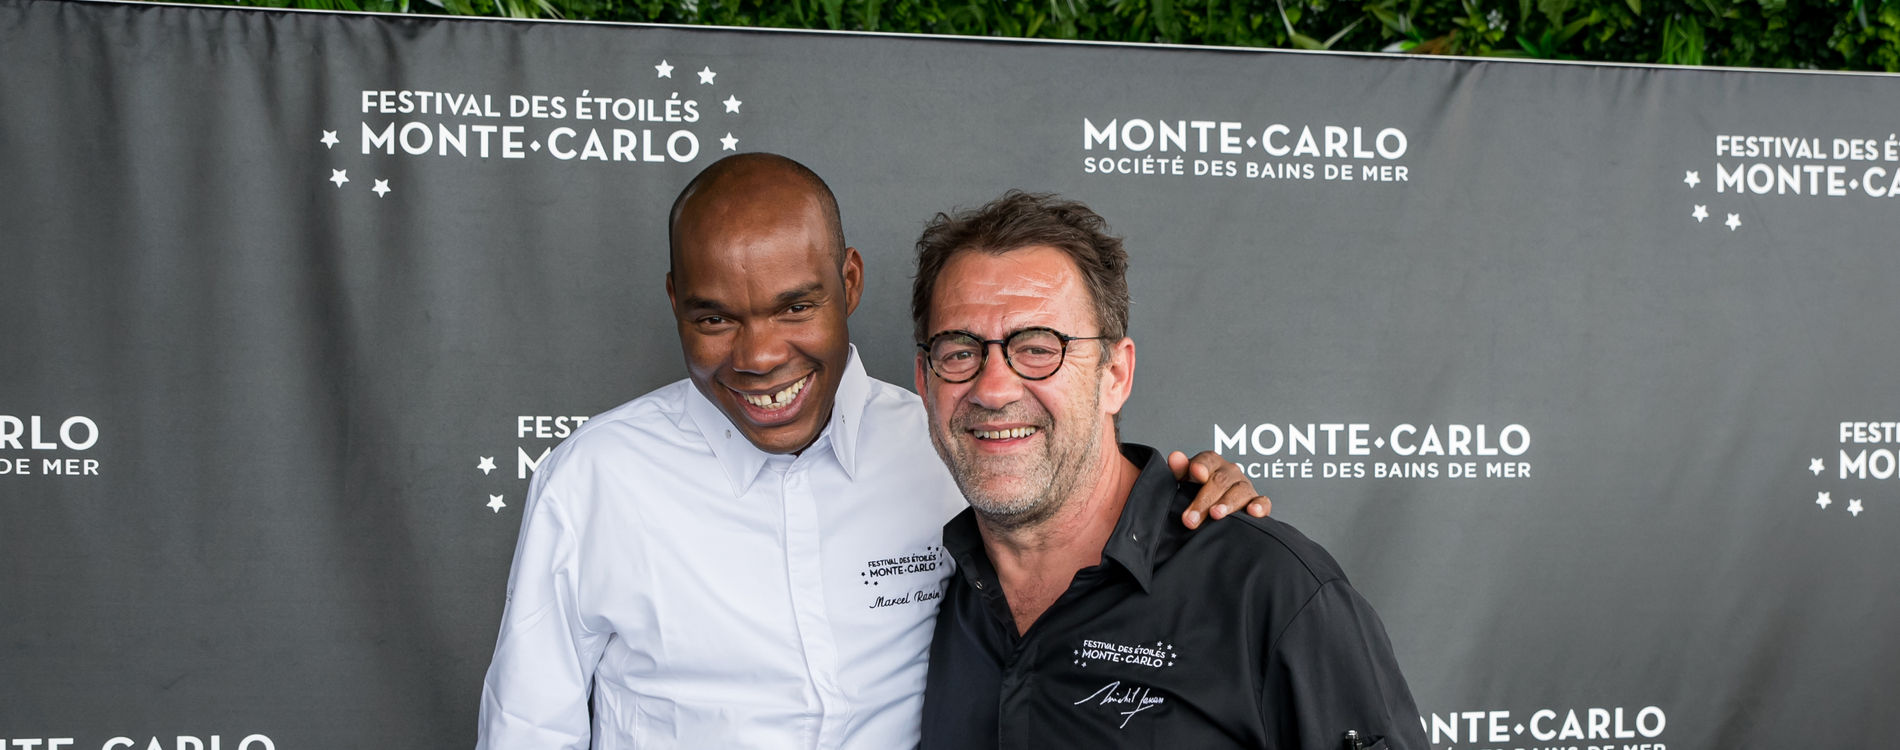 Festival des Etoilés Monte-Carlo- dîner Sarran/Ravin au Blue Bay